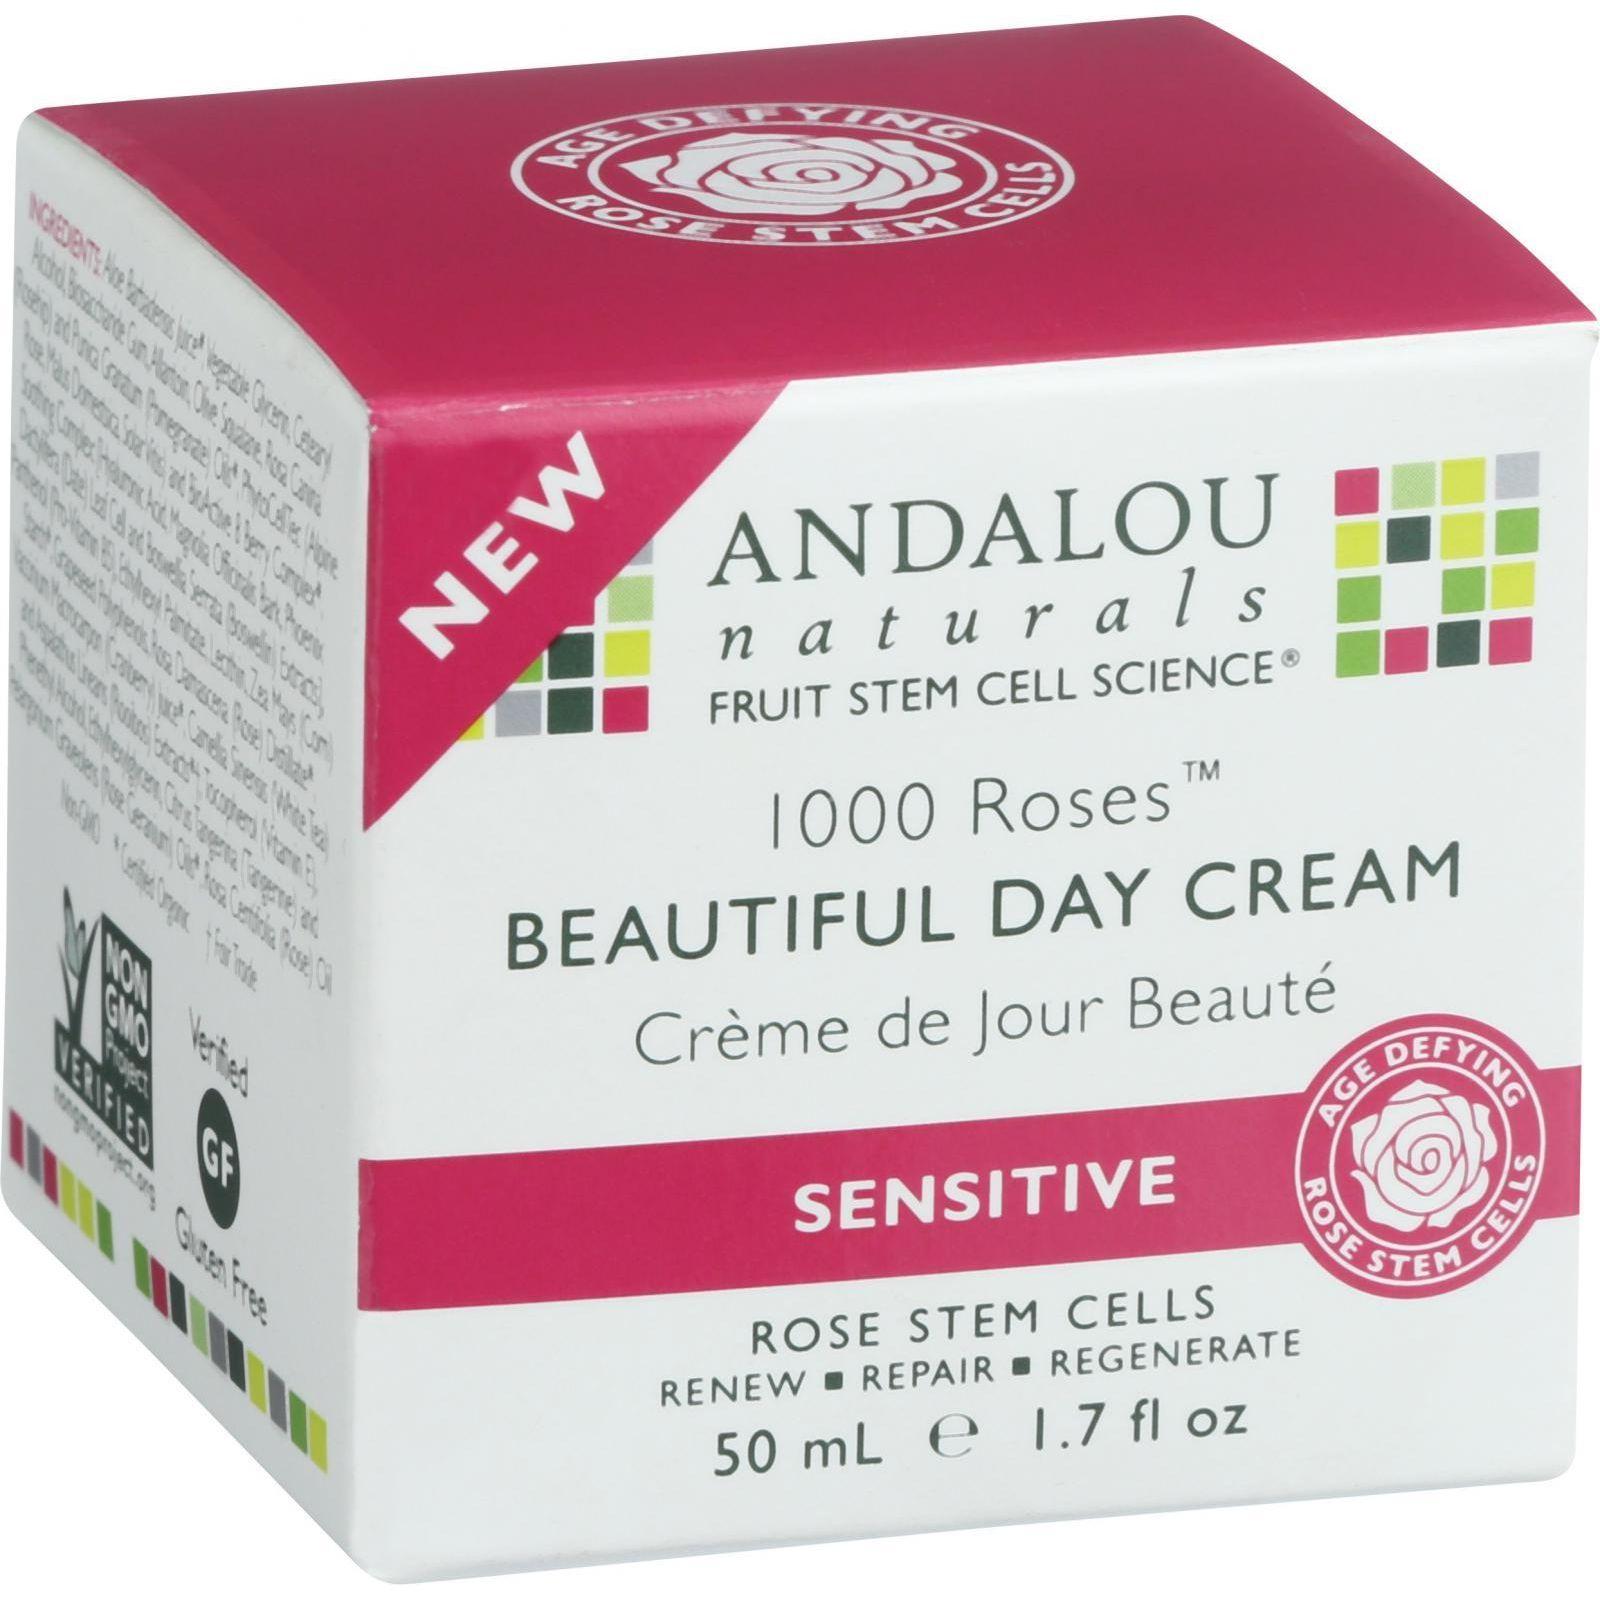 Andalou Naturals Beautiful Day Cream  1000 Roses  1.7 oz